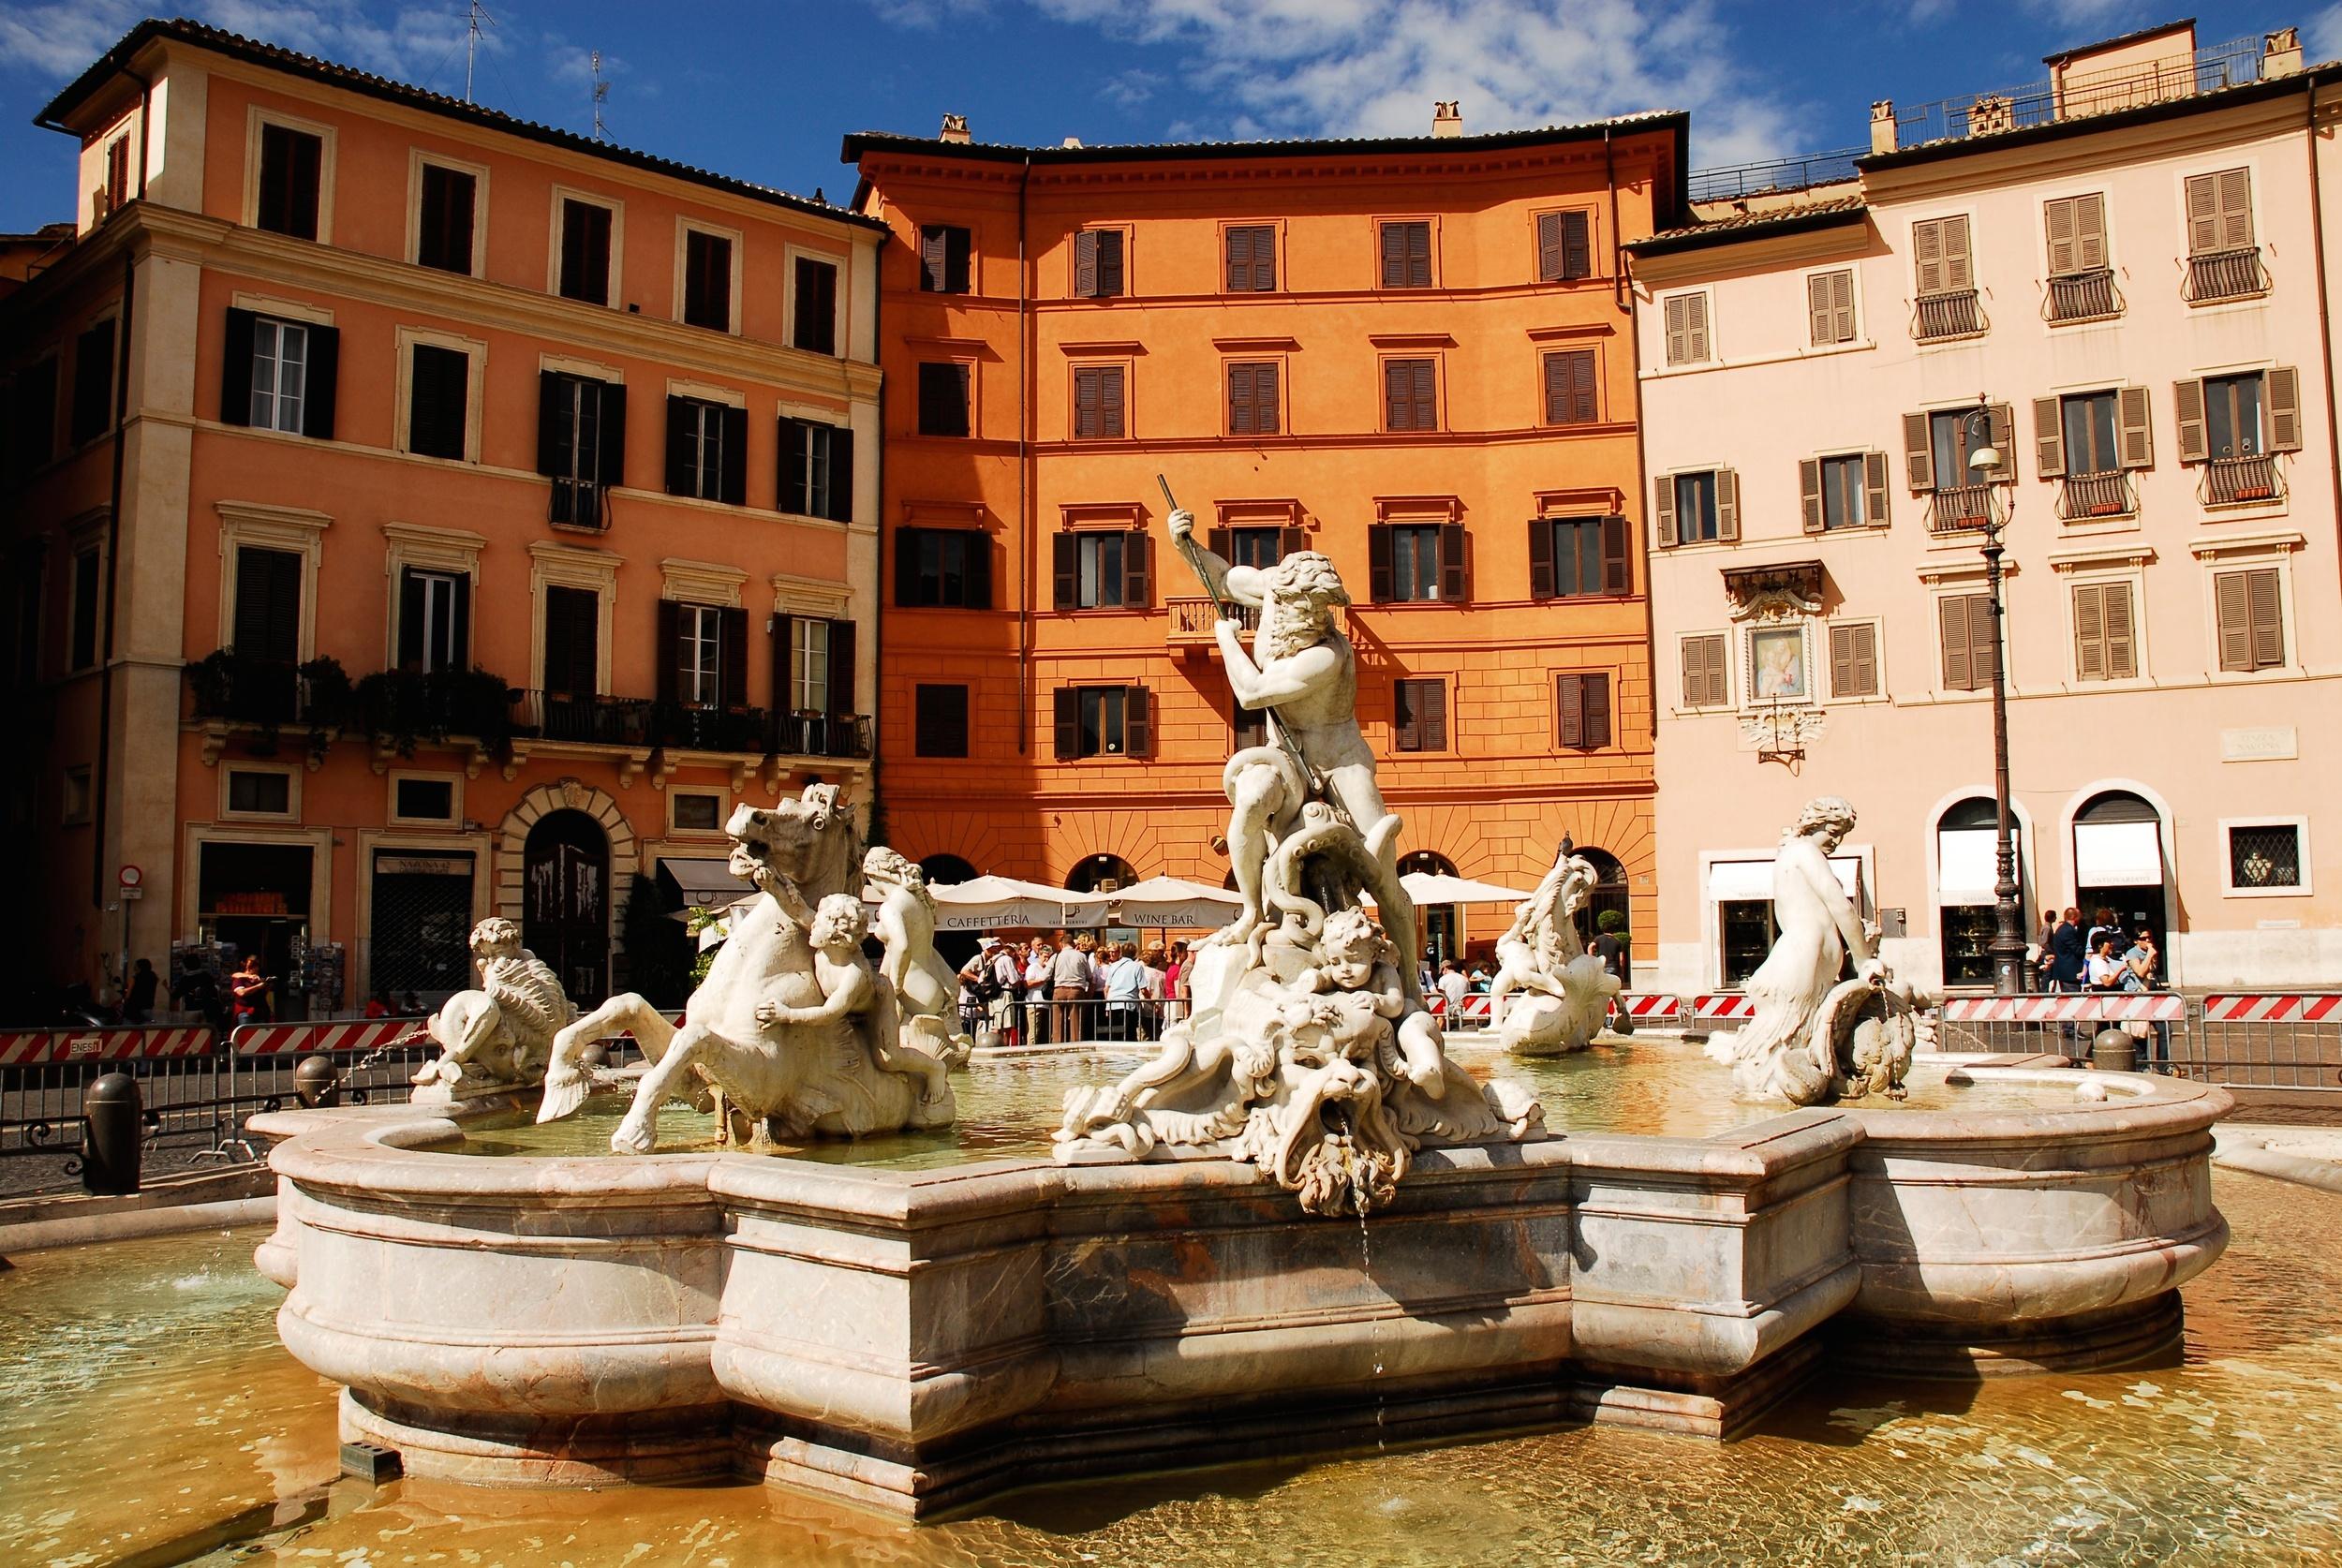 Neptune Fountain in Piazza Navona